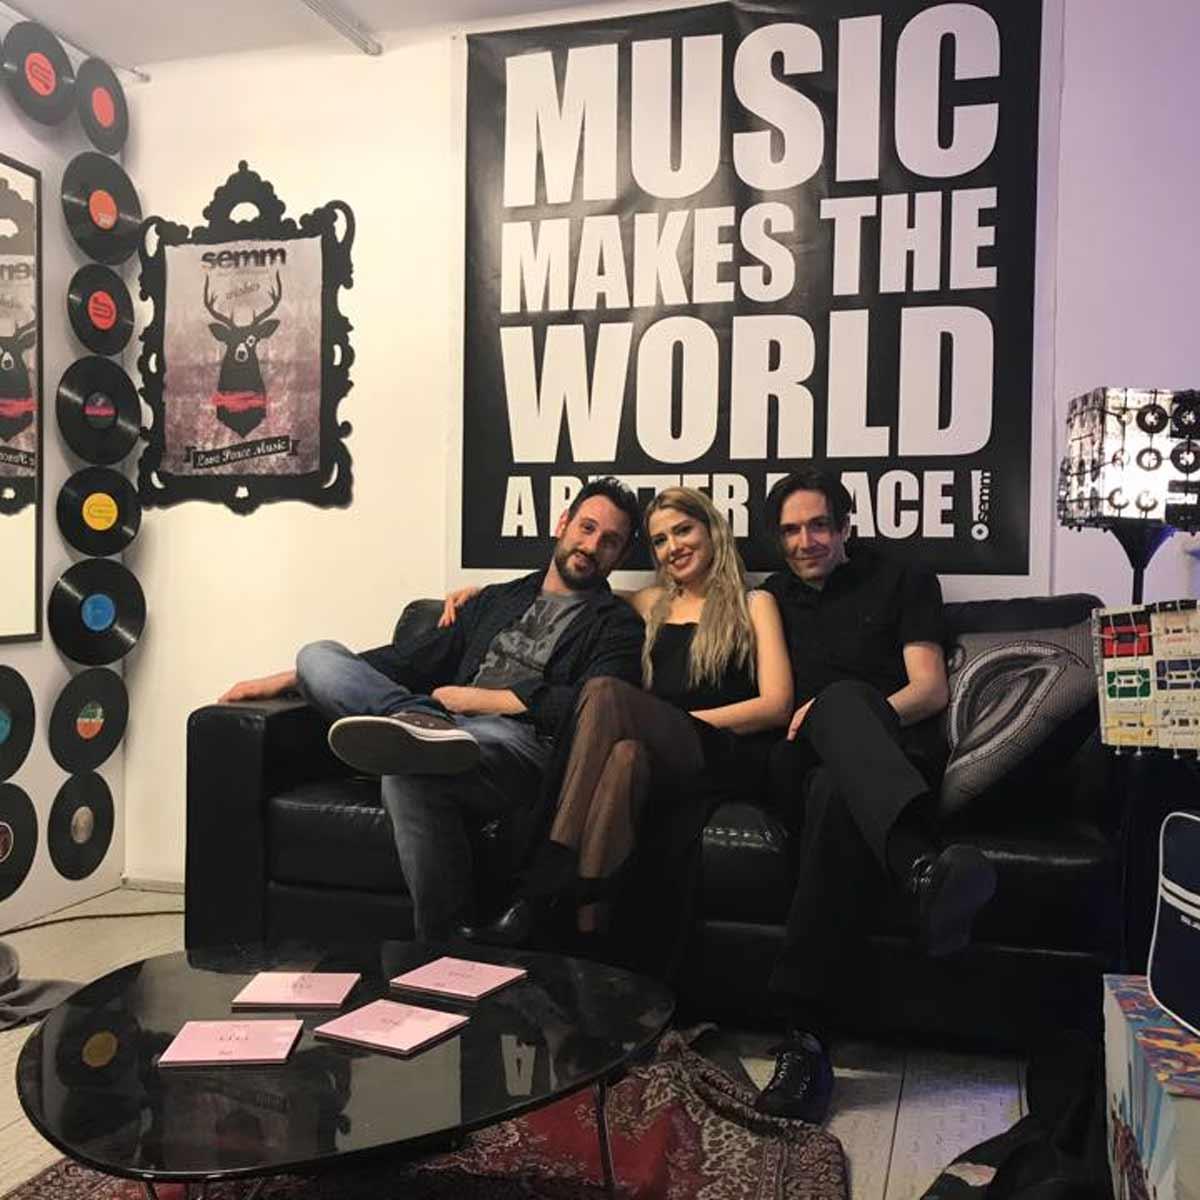 Semm Music Store Special Guest Beatrice Antolini